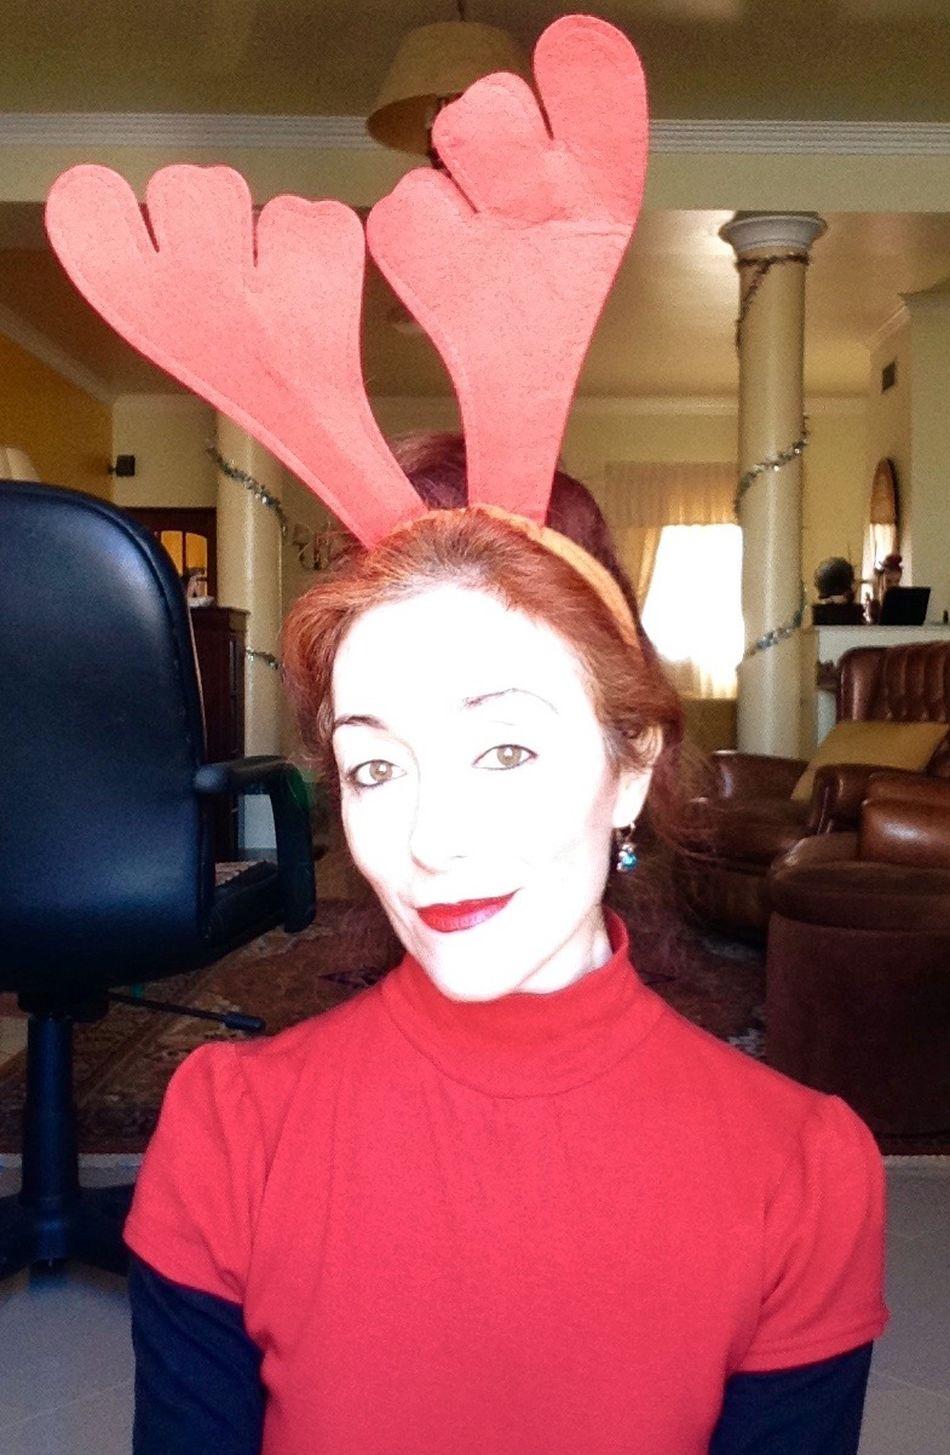 Christmas Day Christmas Reindeer Xmas Profile Picture Profile Selfportrait Selfie